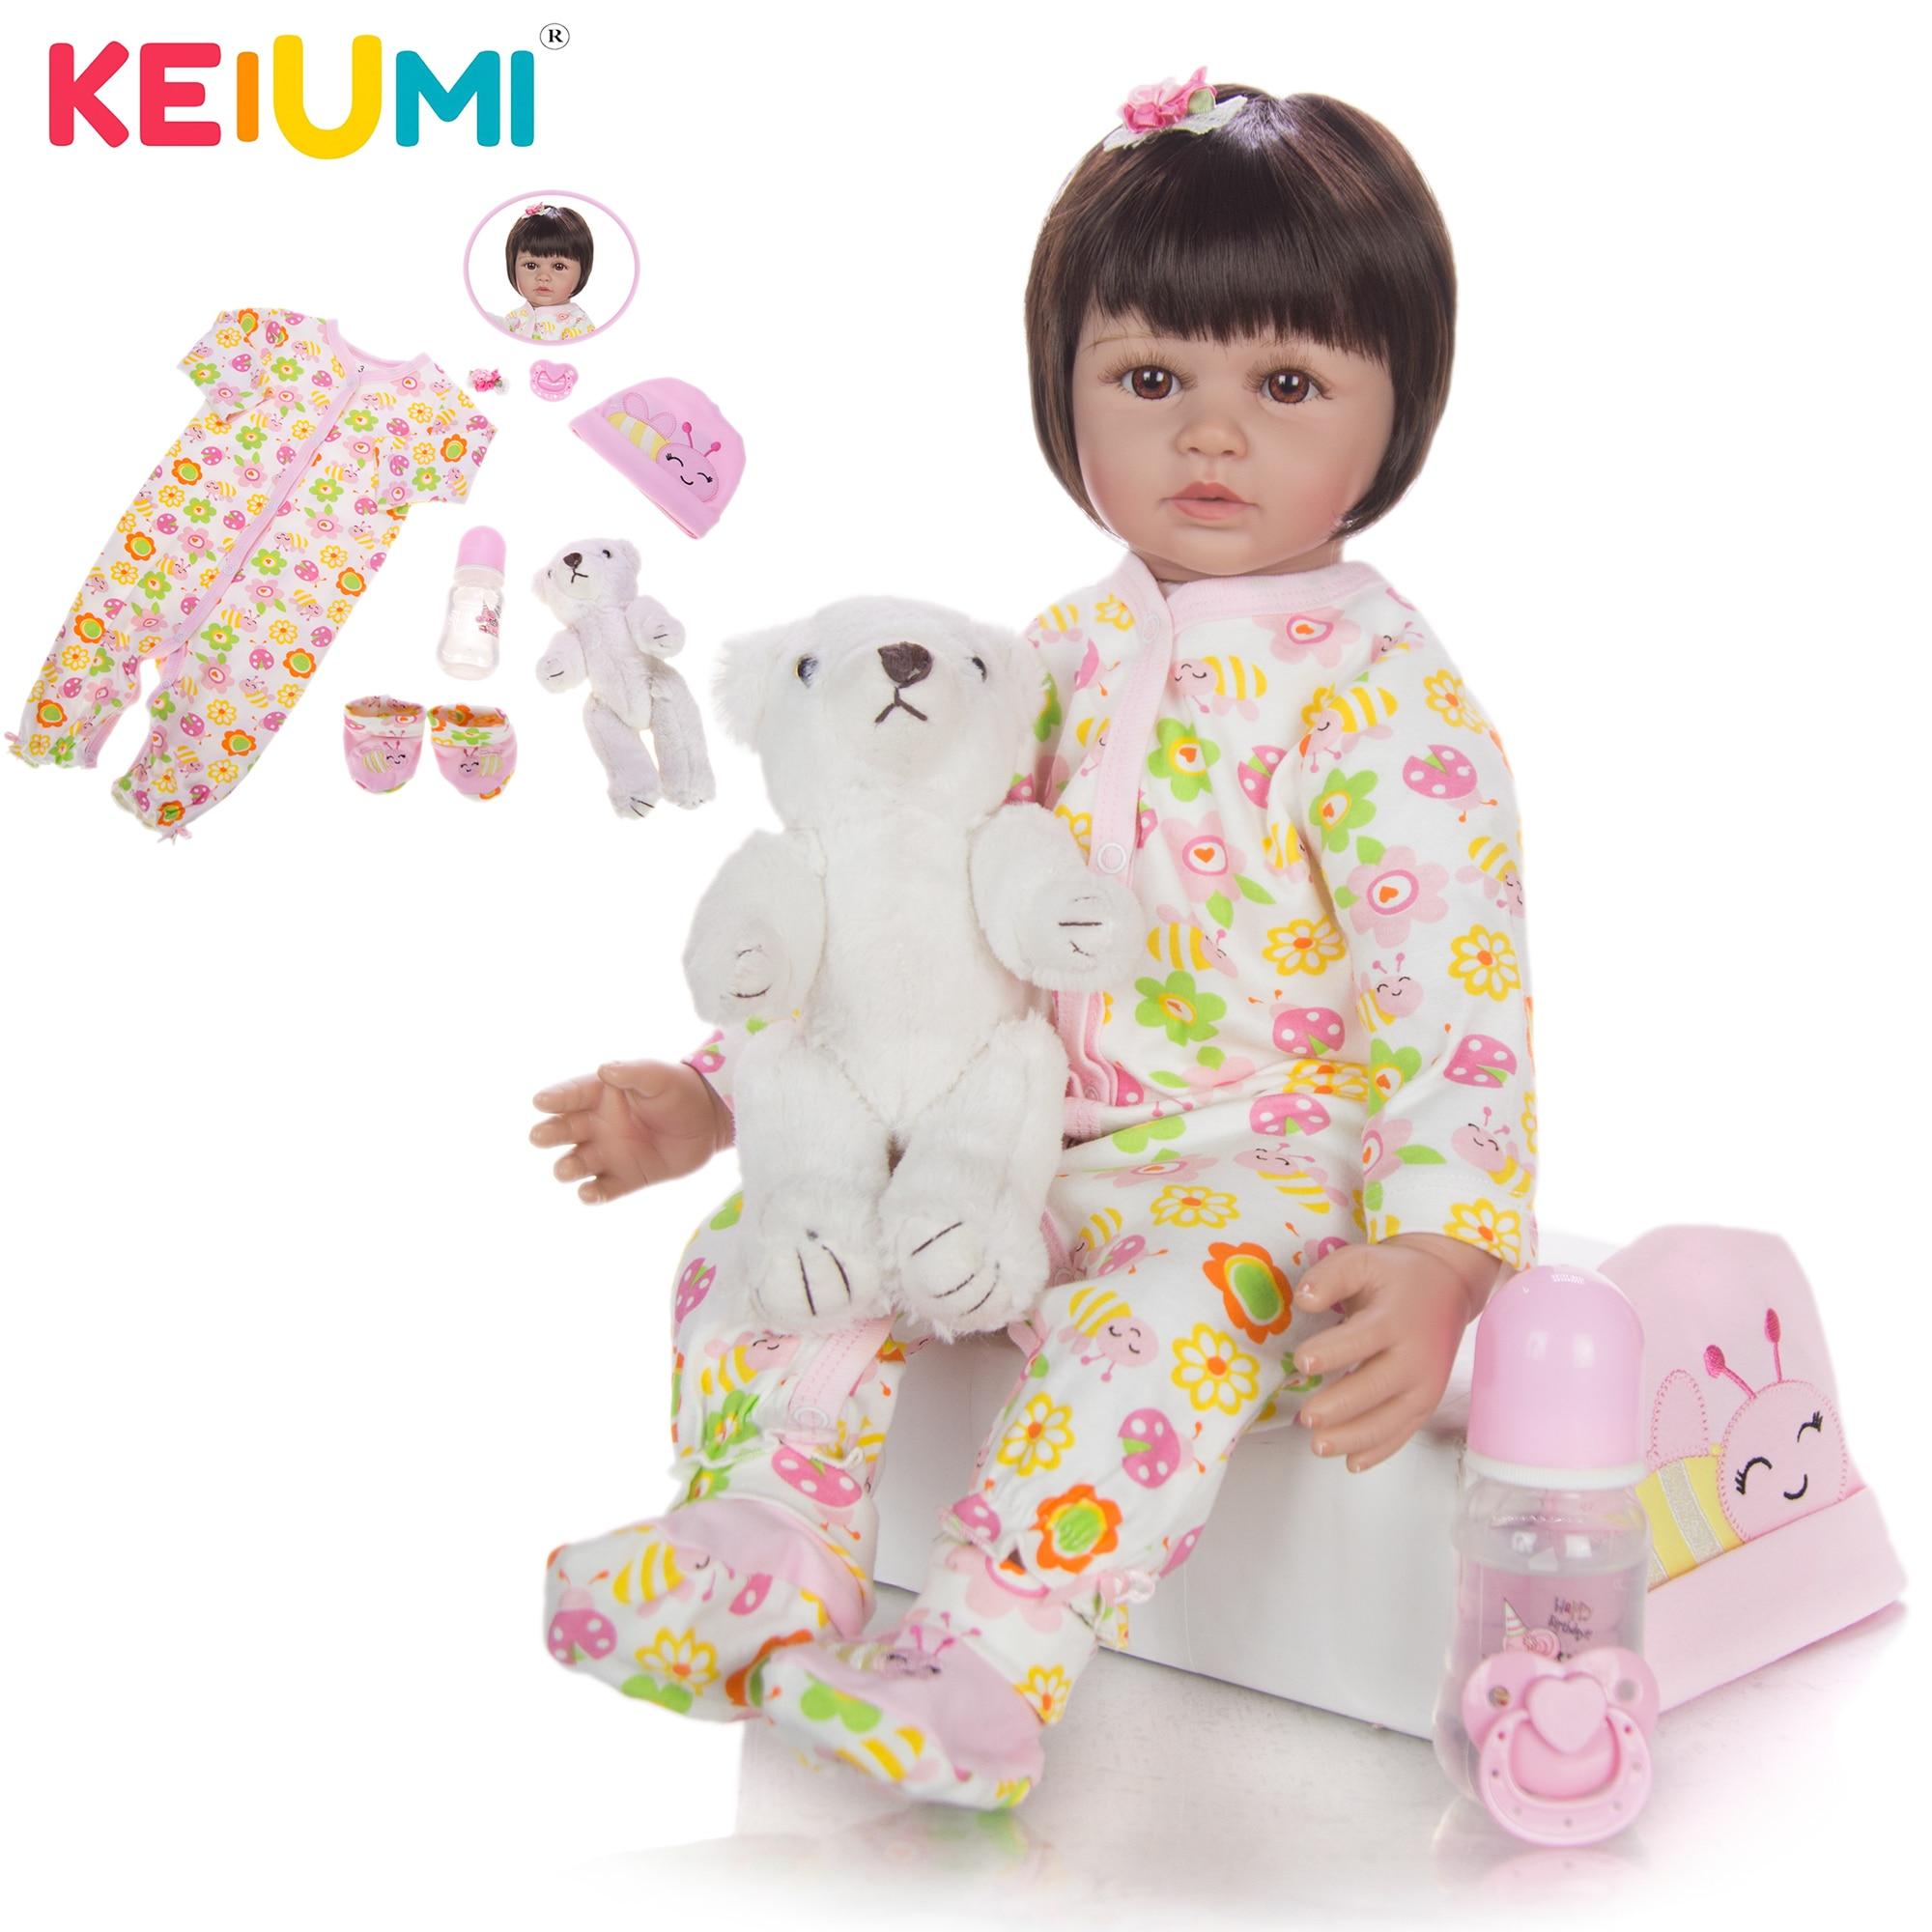 KEIUMI Модная Кукла Reborn 60 см силиконовая Мягкая кукла Baby Reborn Boneca Menina Lifelike Bebe House Play Toy Kid Gift